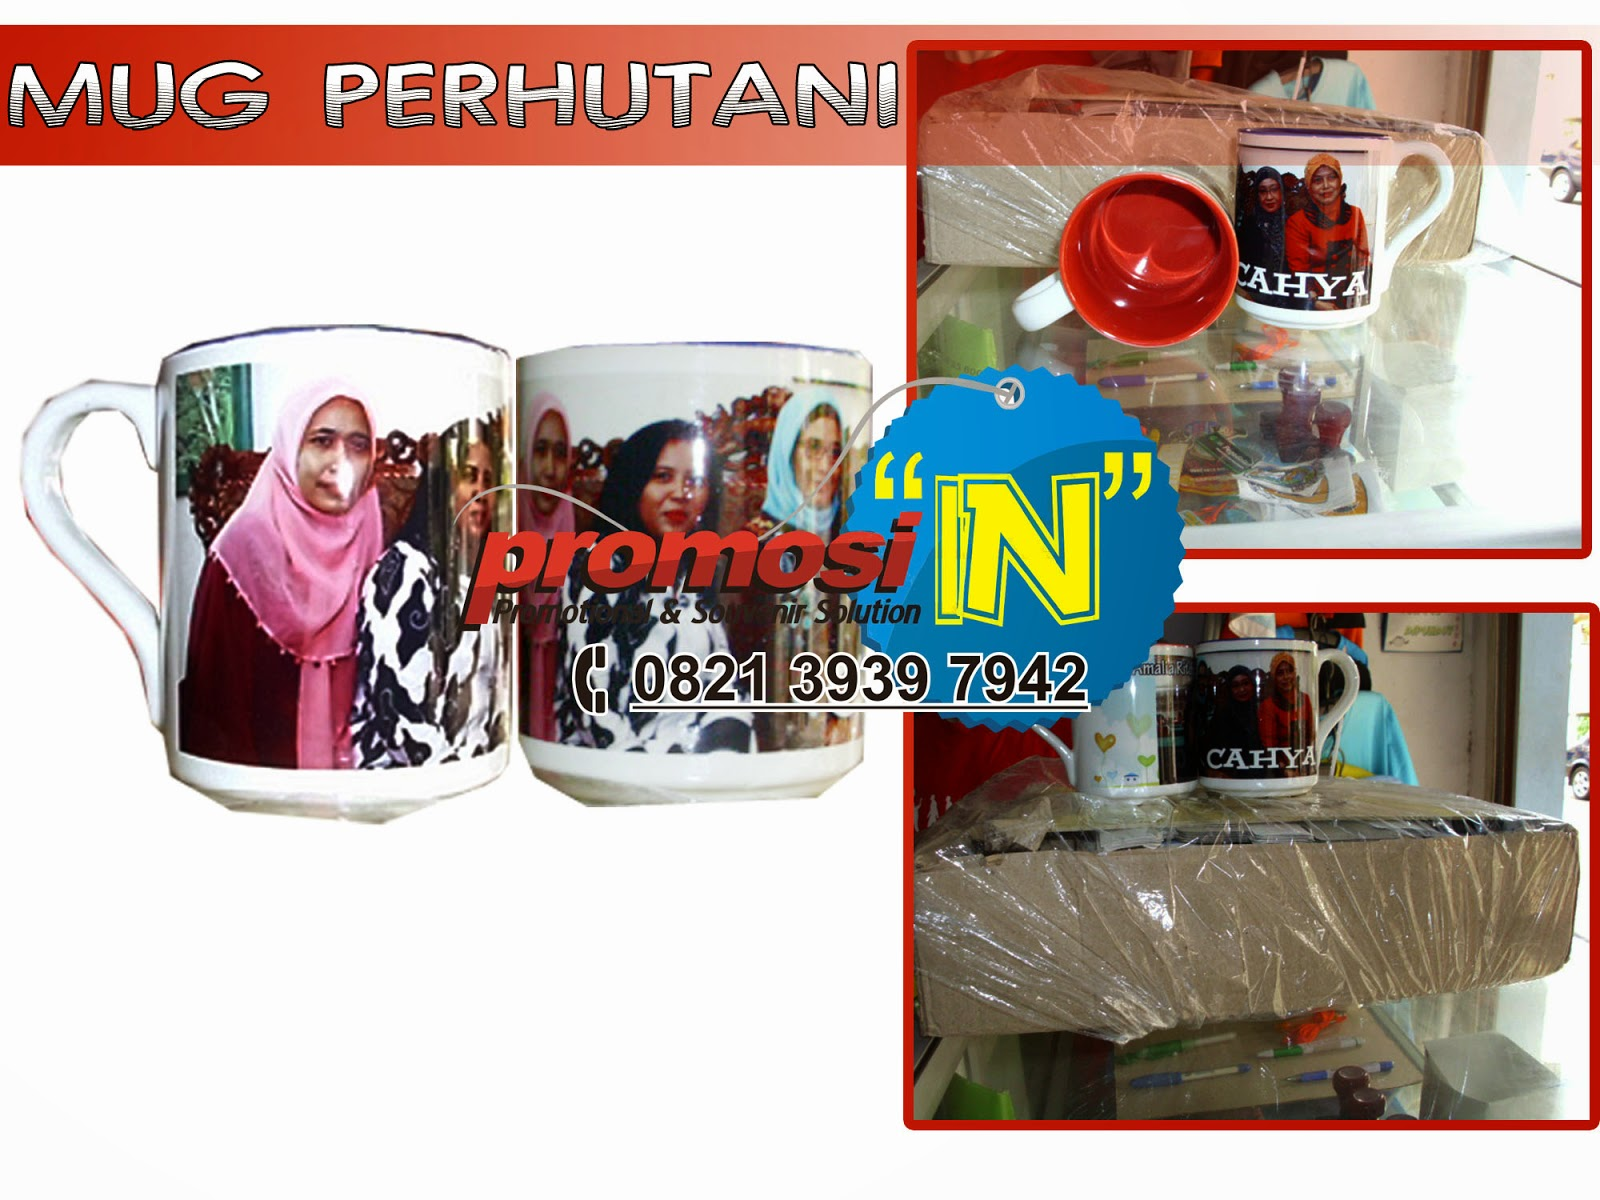 Mug,Agen Mug Murah,Agen Mug Foto,Agen Mug di Surabaya,Agen Mug Cantik,Agen Mug Souvenir